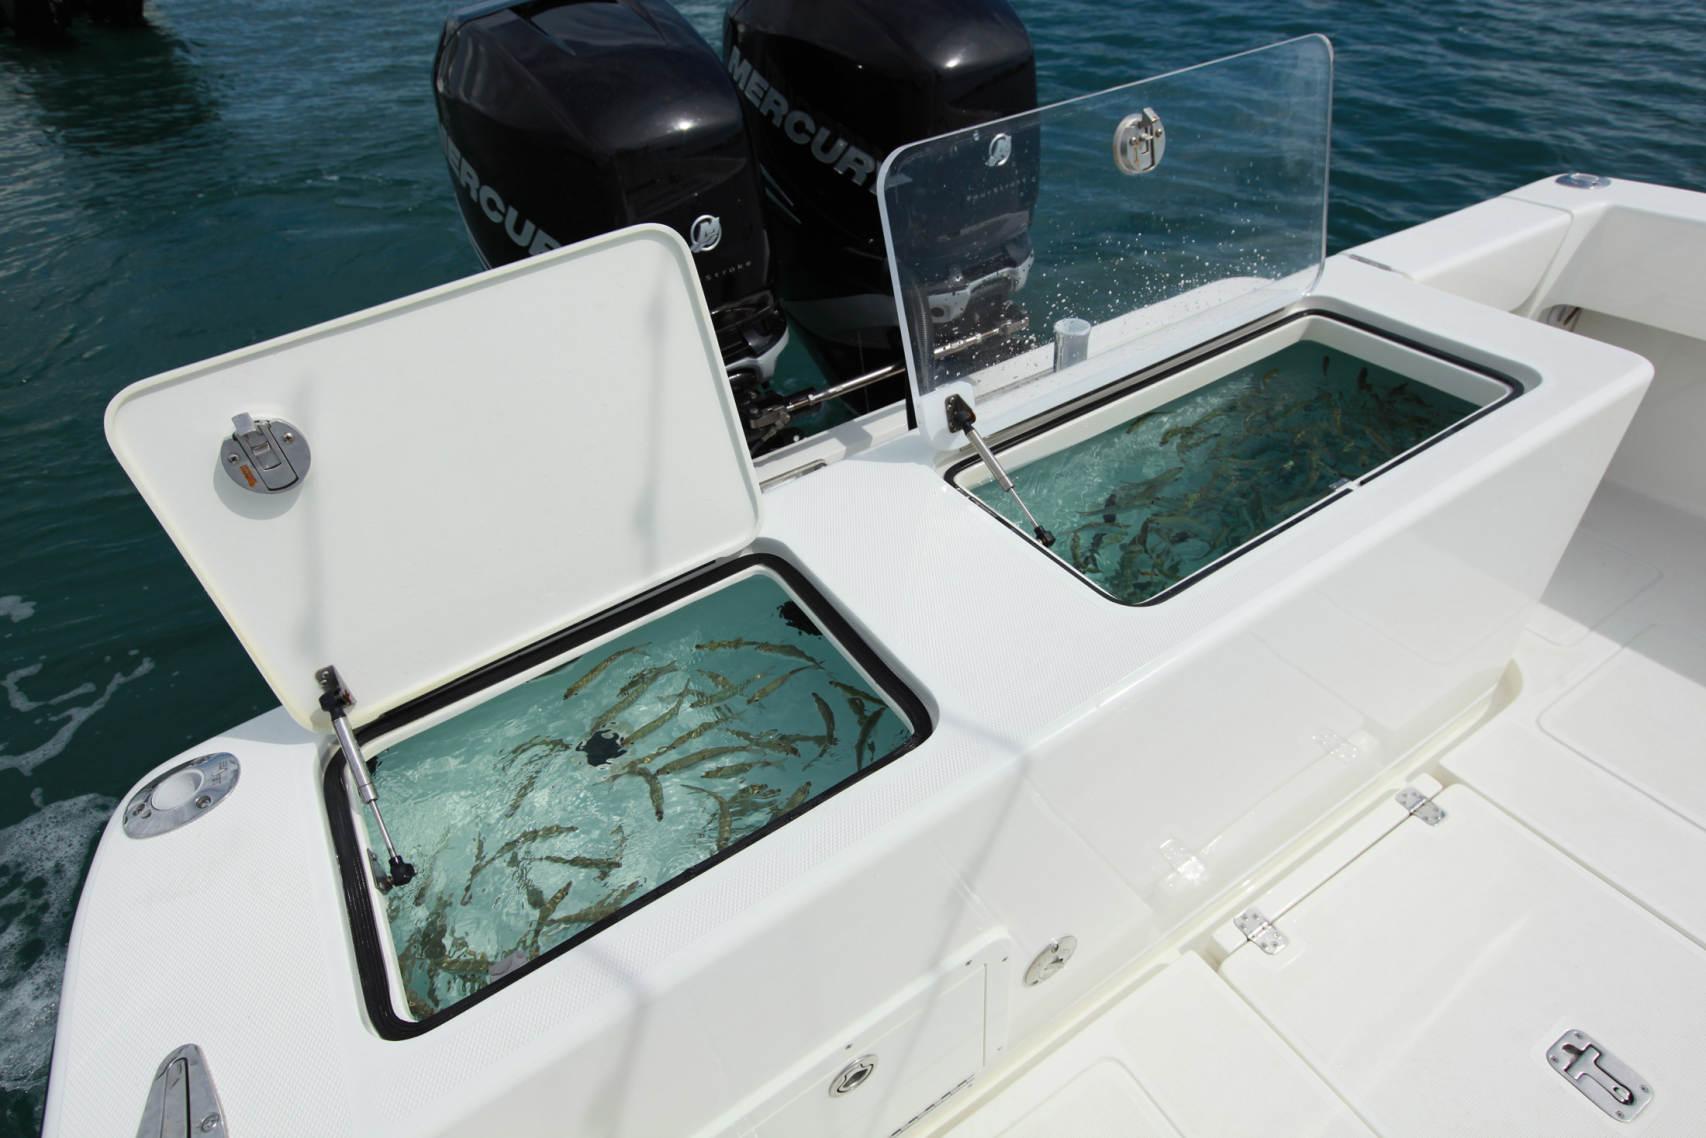 Seavee 320 Model Info Center Console Fishing Boat